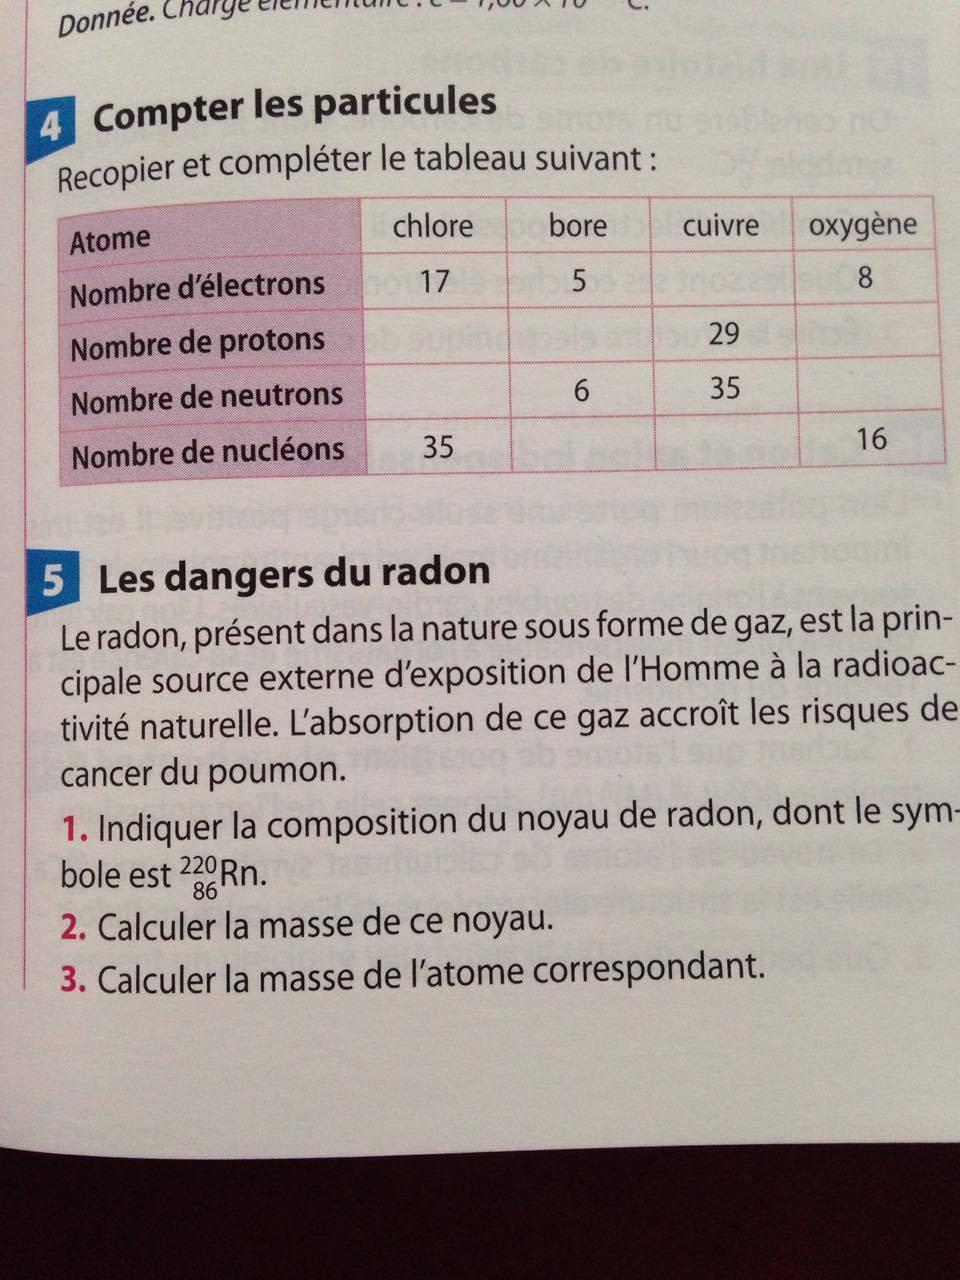 composition du noyau de radon